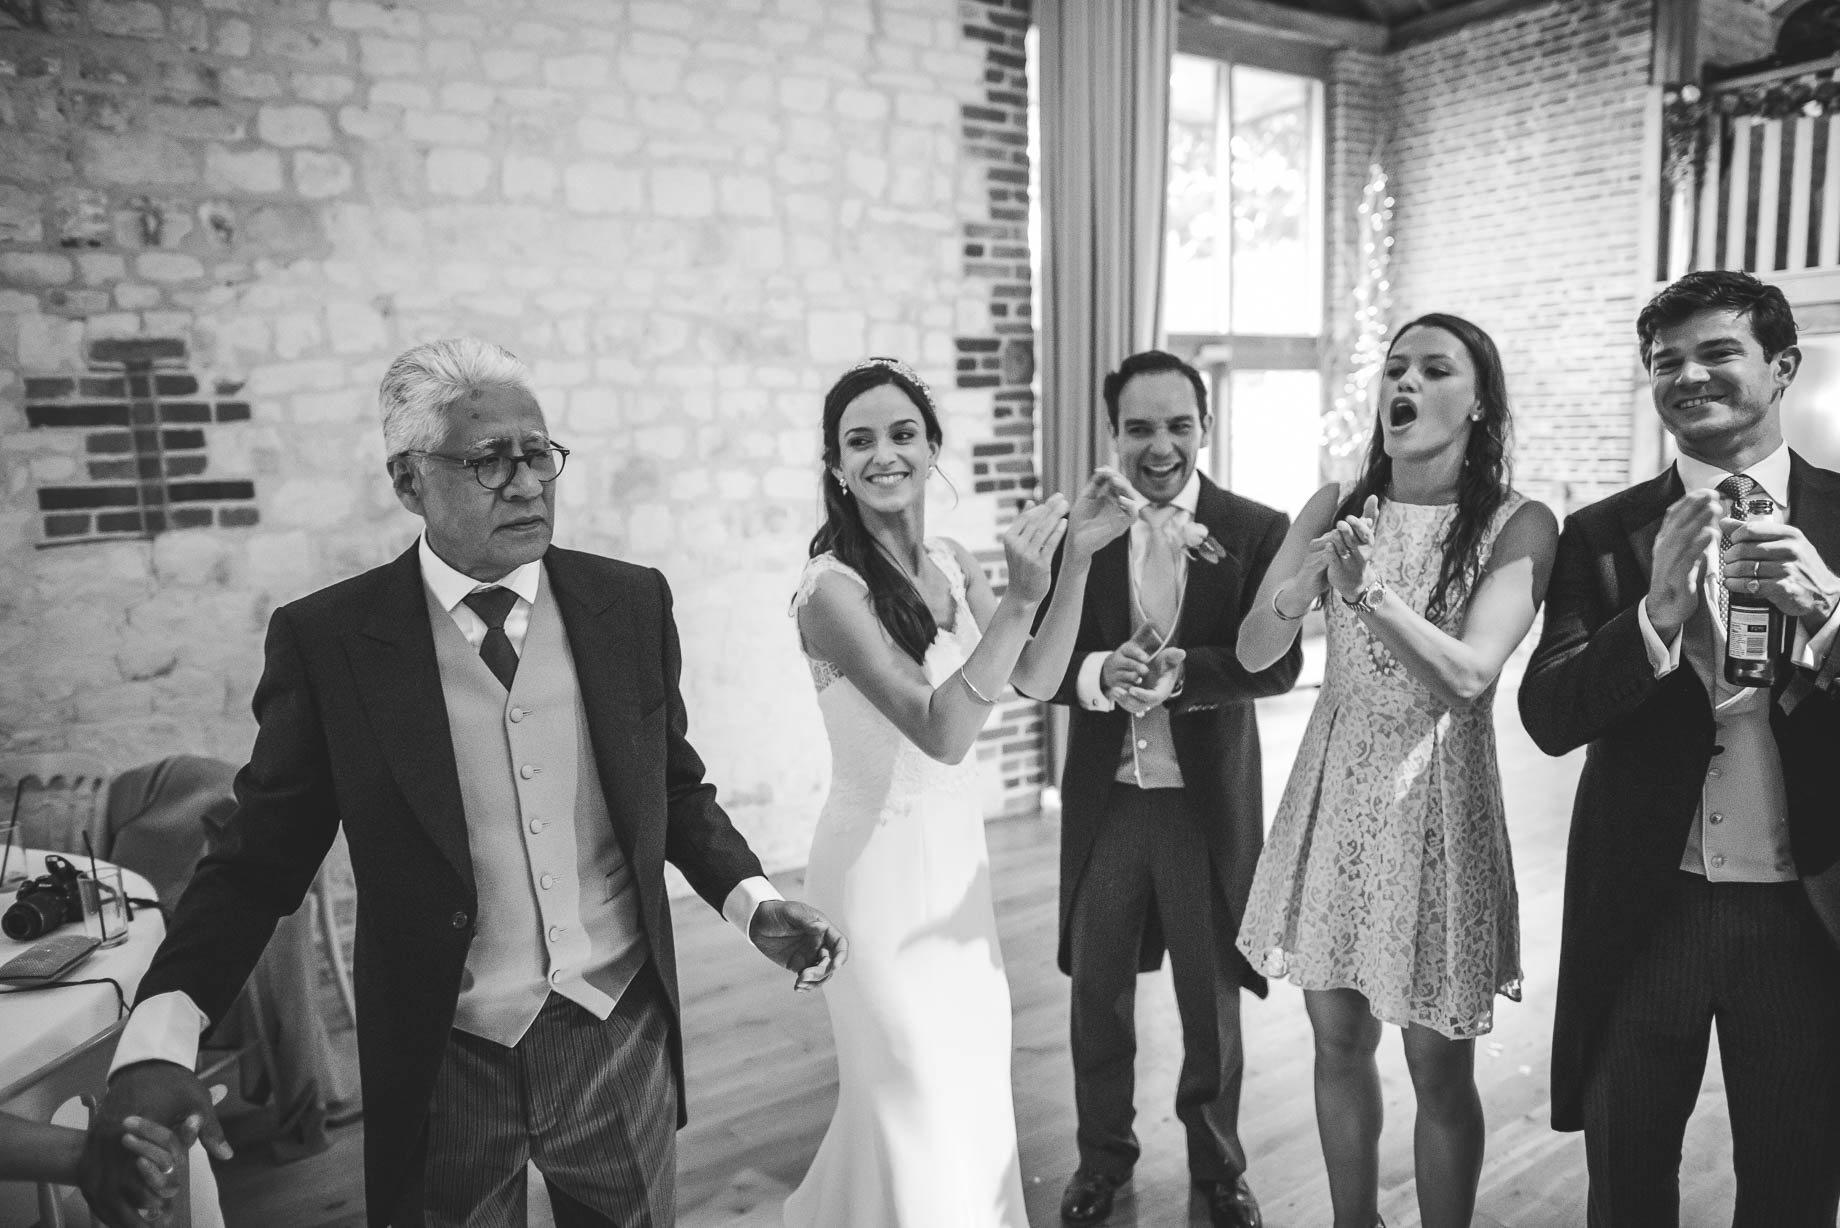 Bury Court Barn Wedding Photography - Caroline and Rob (219 of 219)